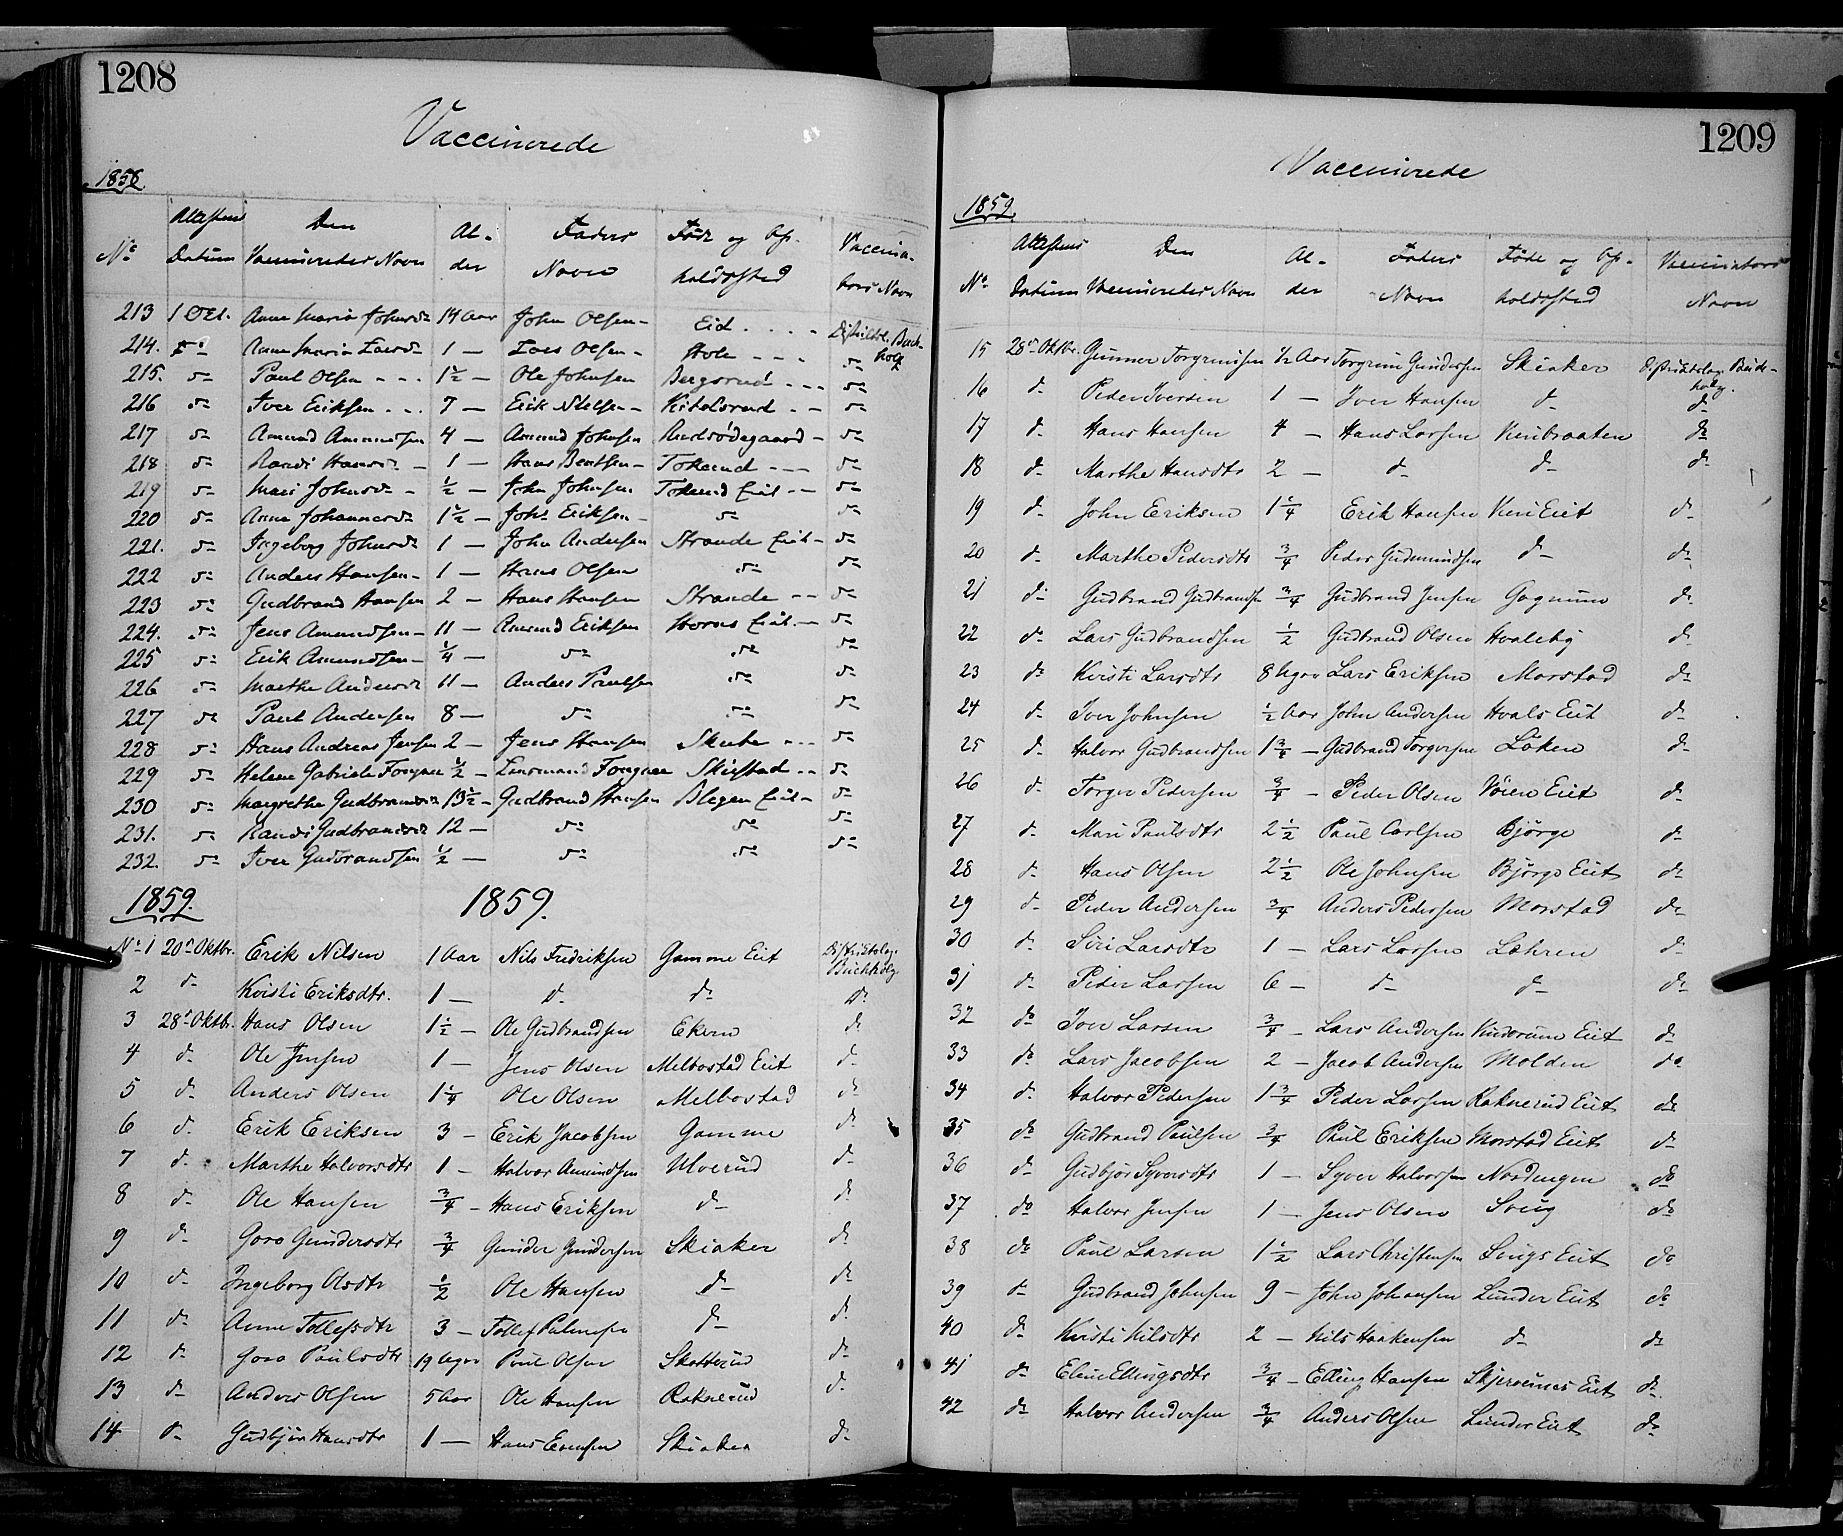 SAH, Gran prestekontor, Ministerialbok nr. 12, 1856-1874, s. 1208-1209